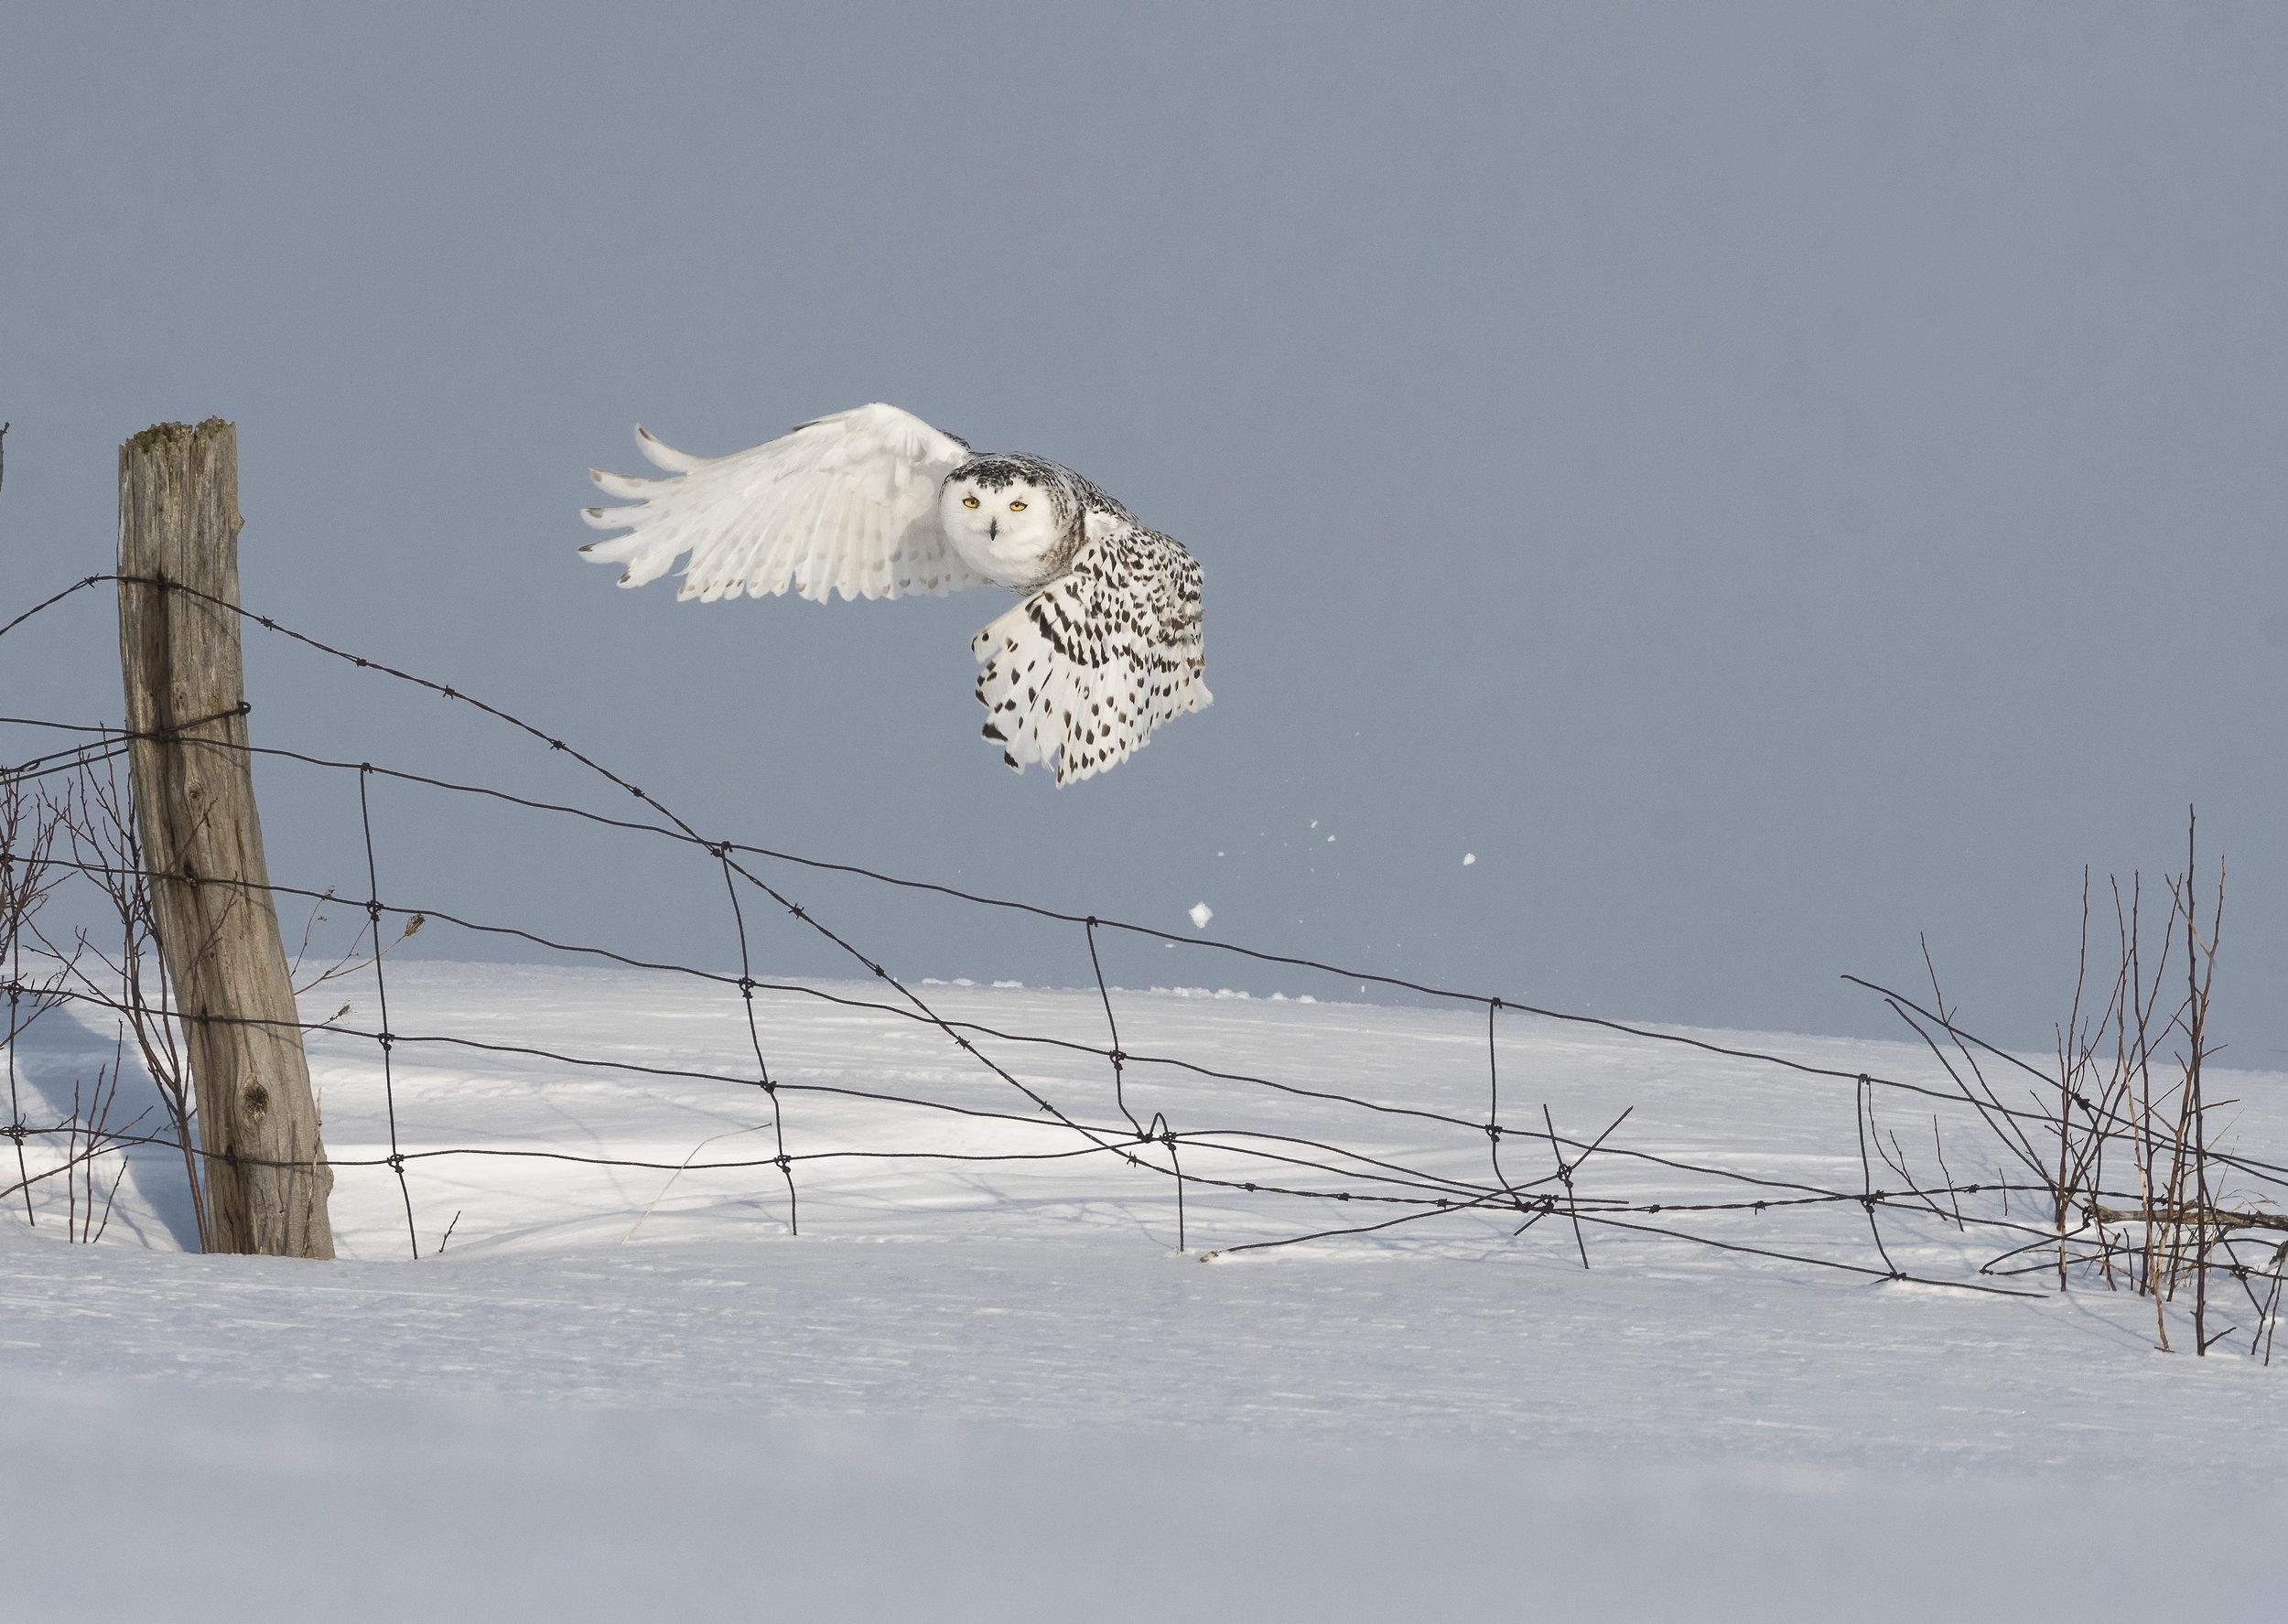 snowy owl launching from fenceline.jpg